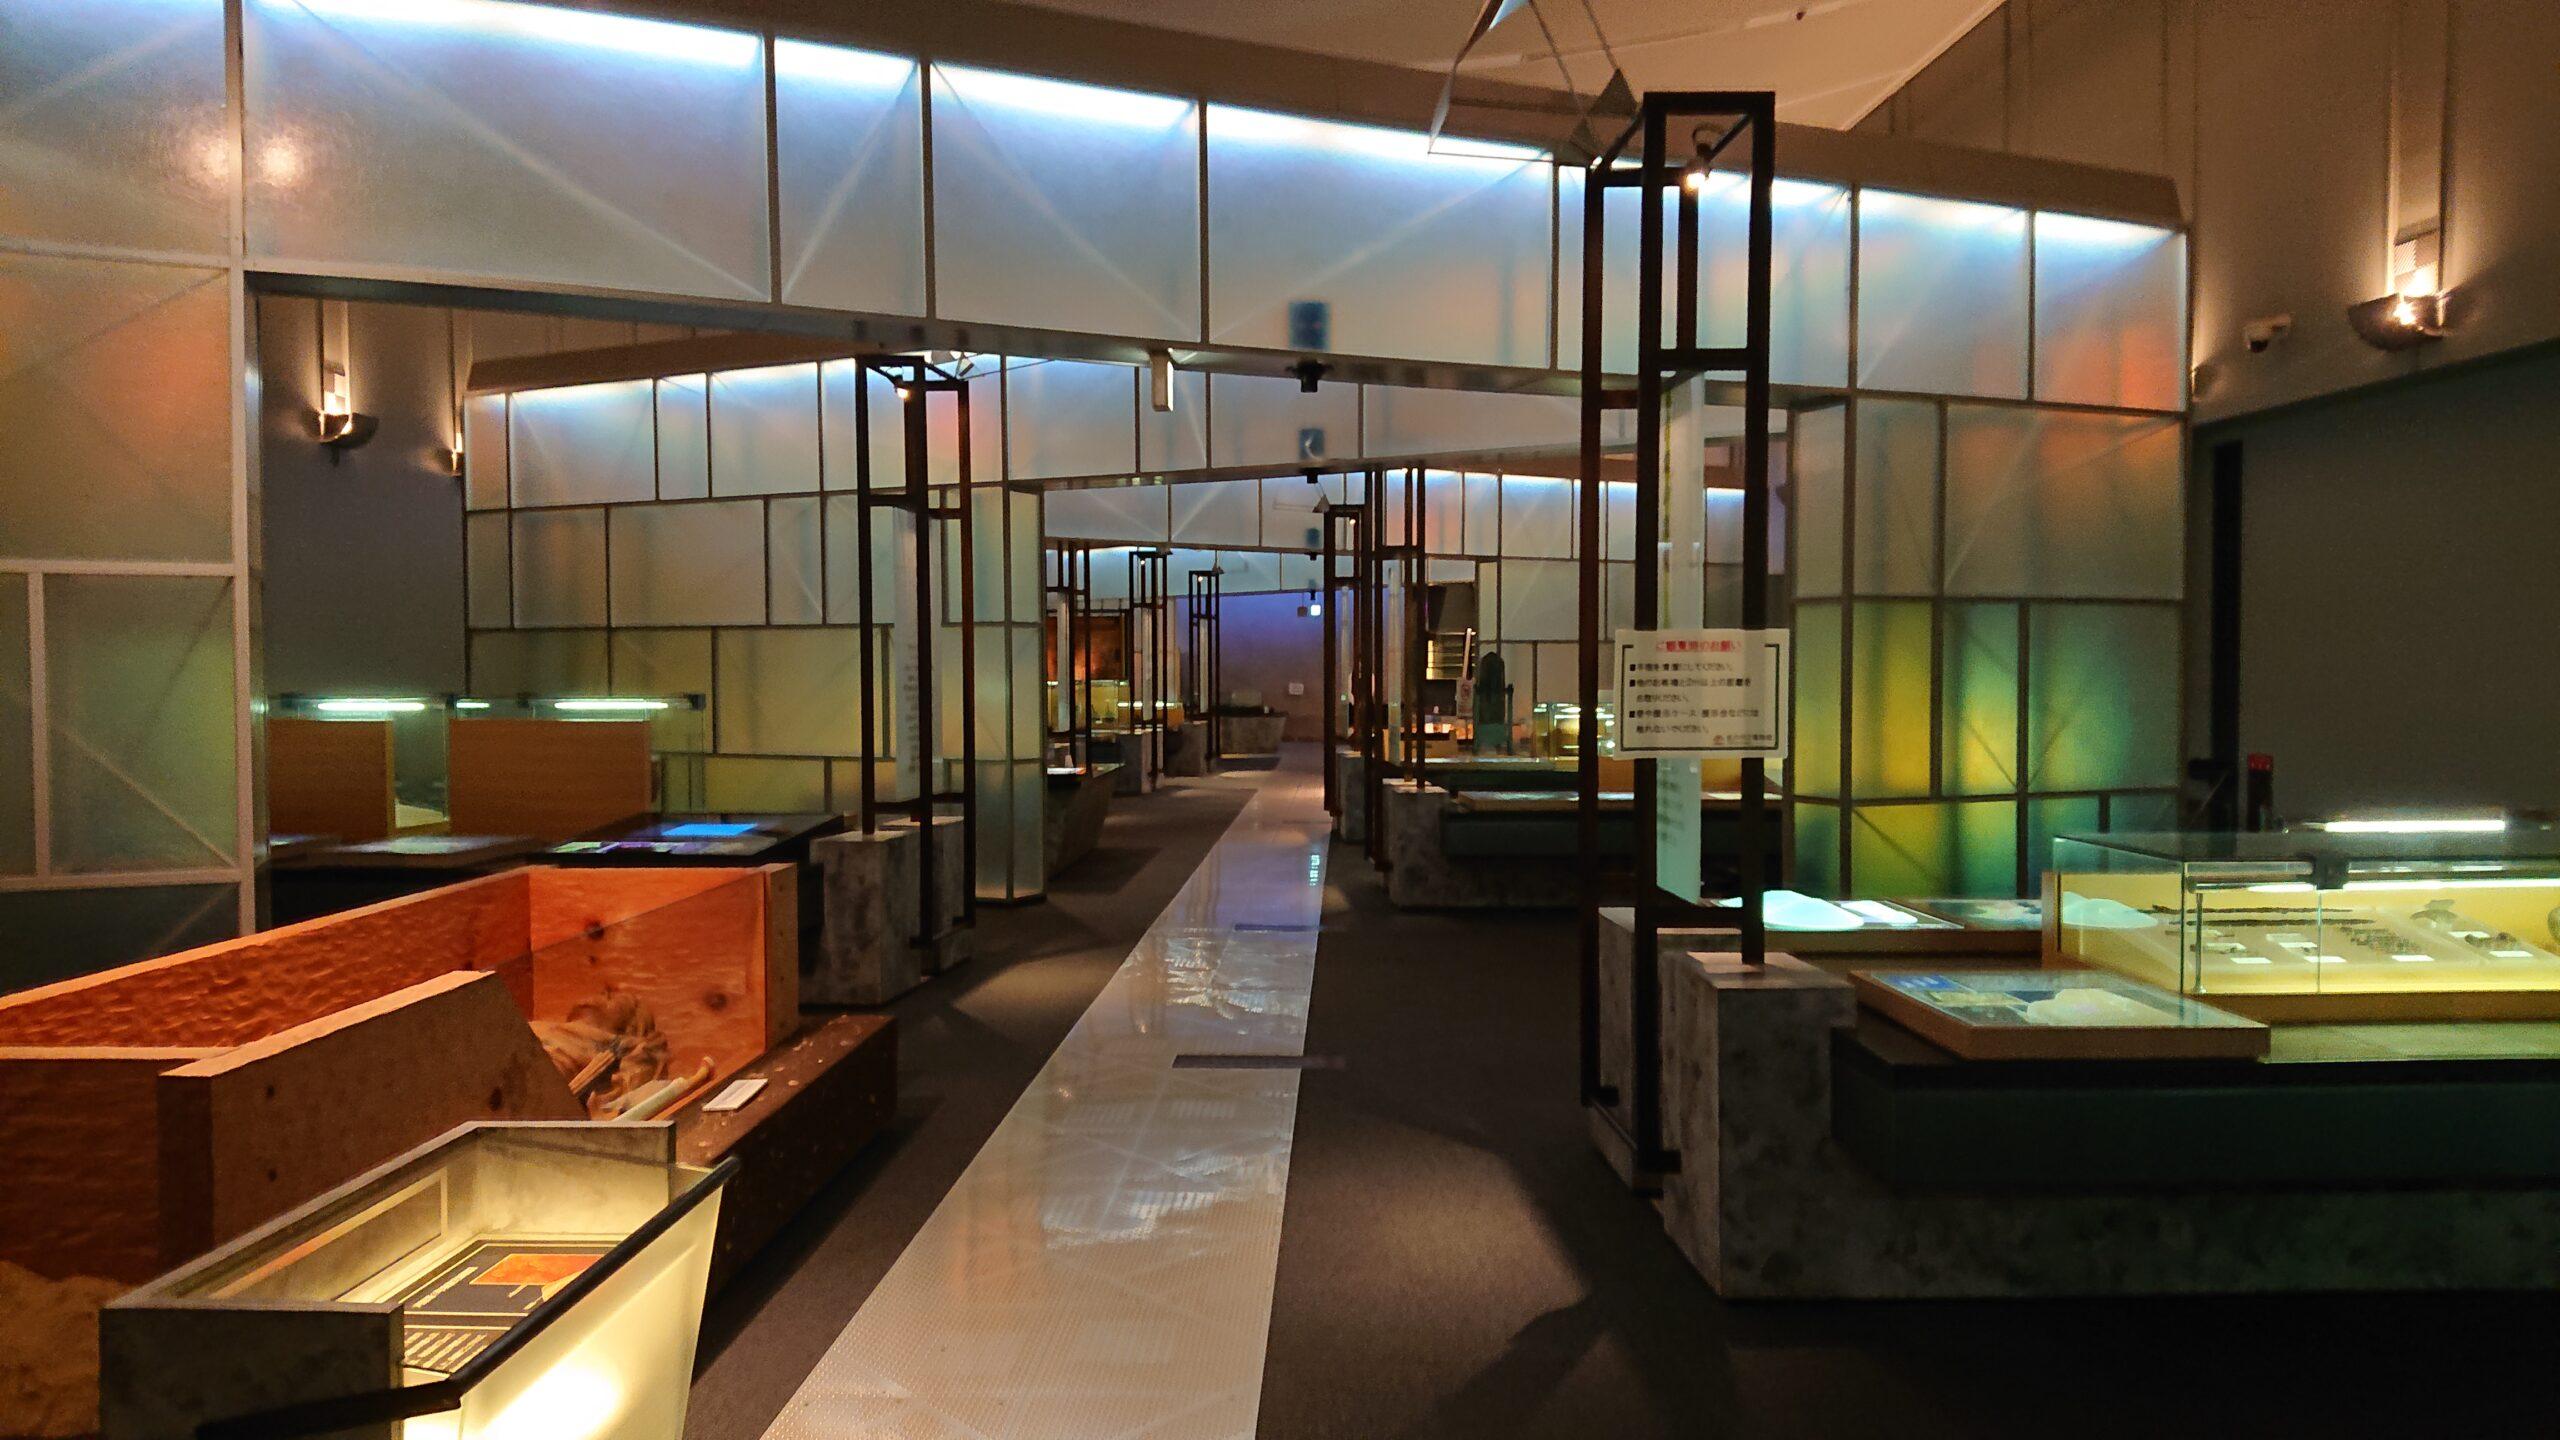 松戸市立博物館の展示